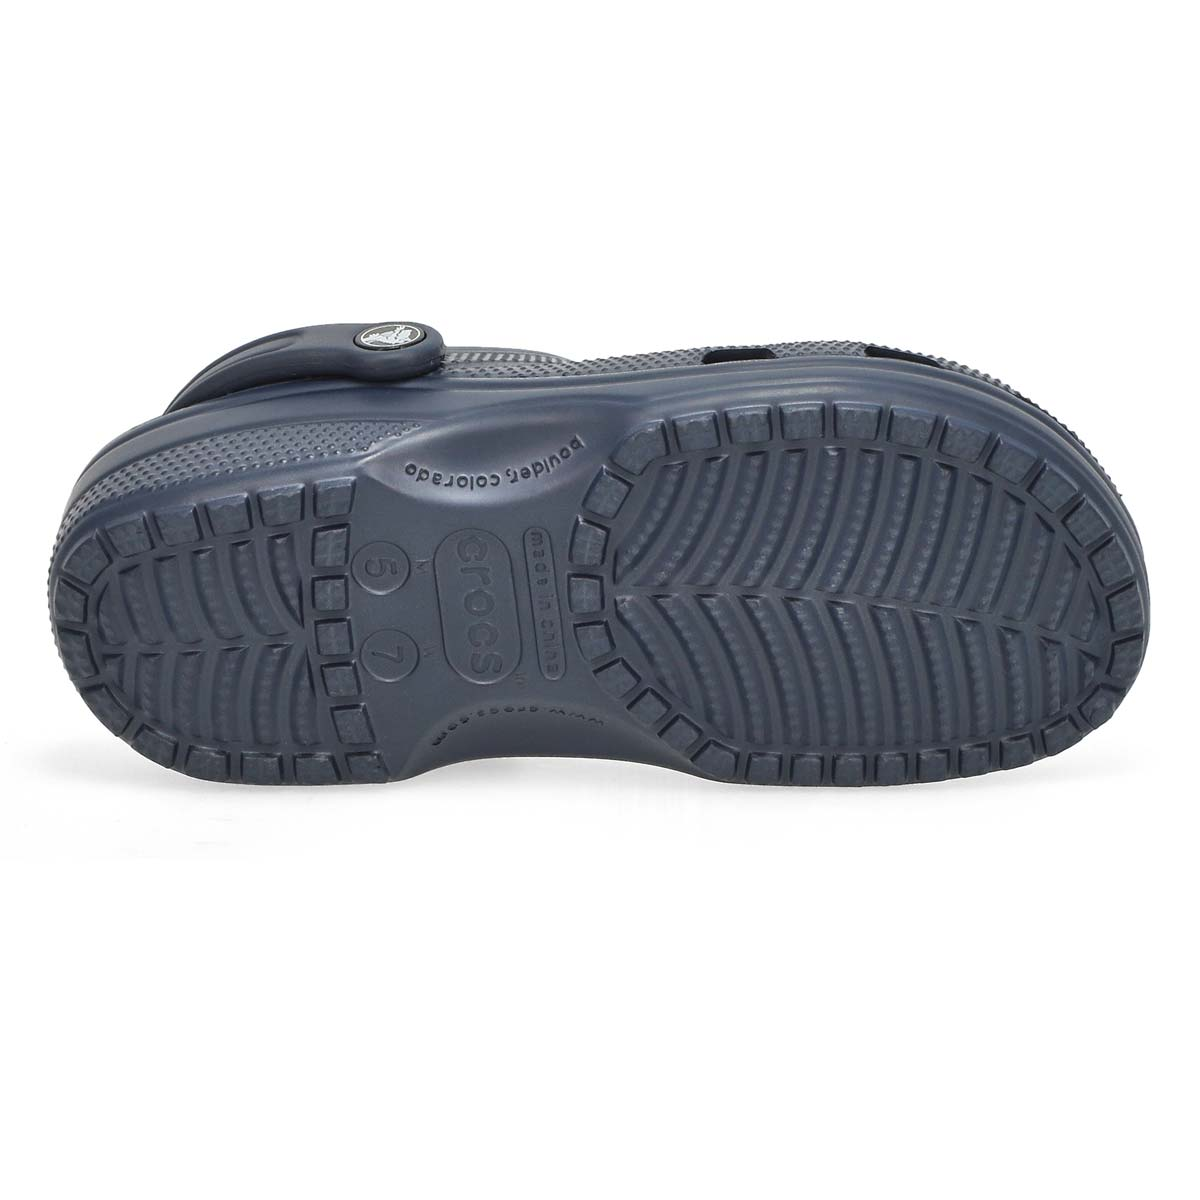 Lds Classic navy EVA comfort clog